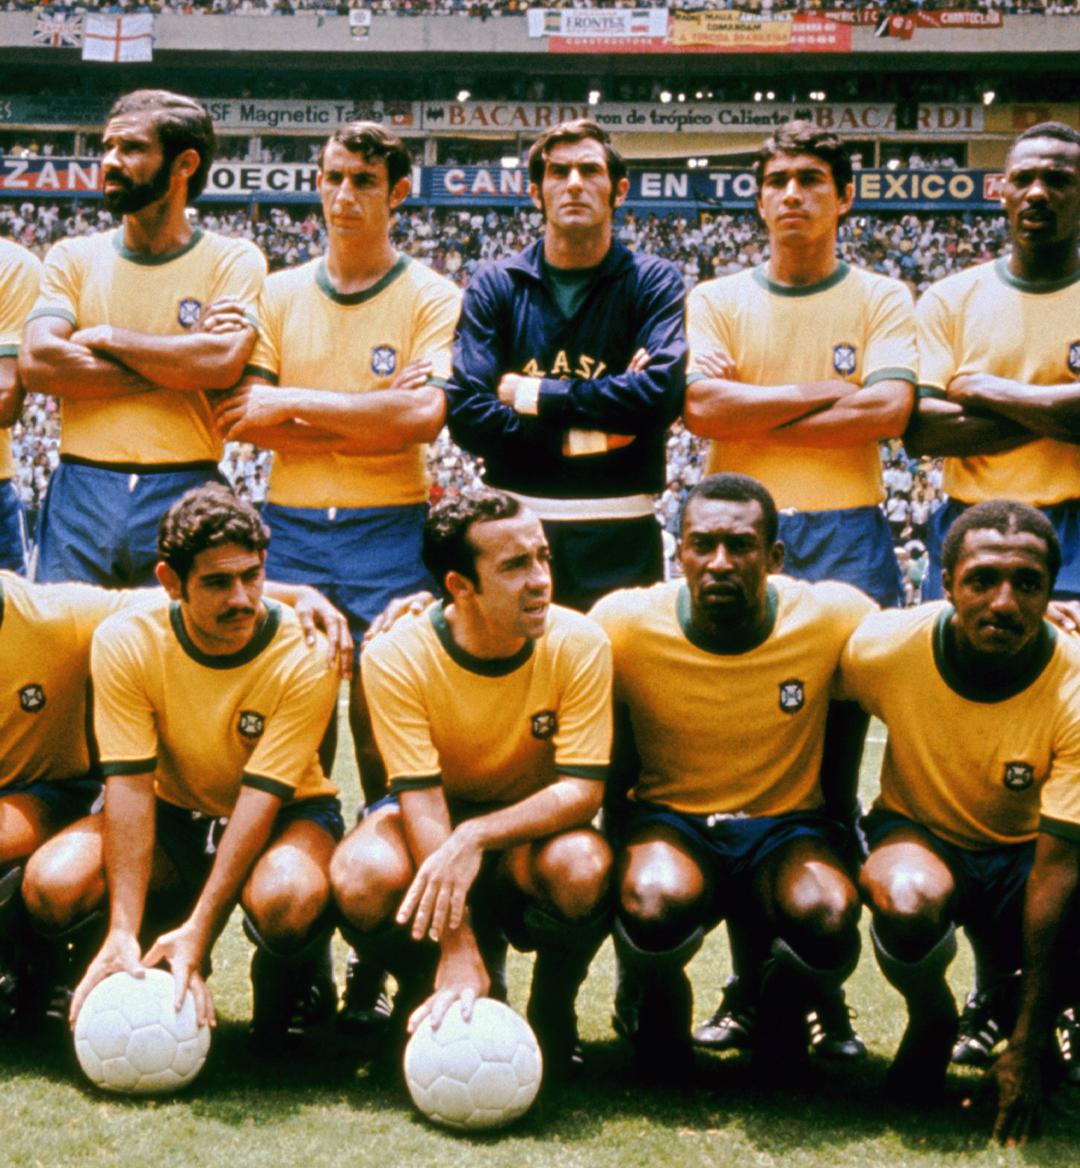 brazil jersey mobile